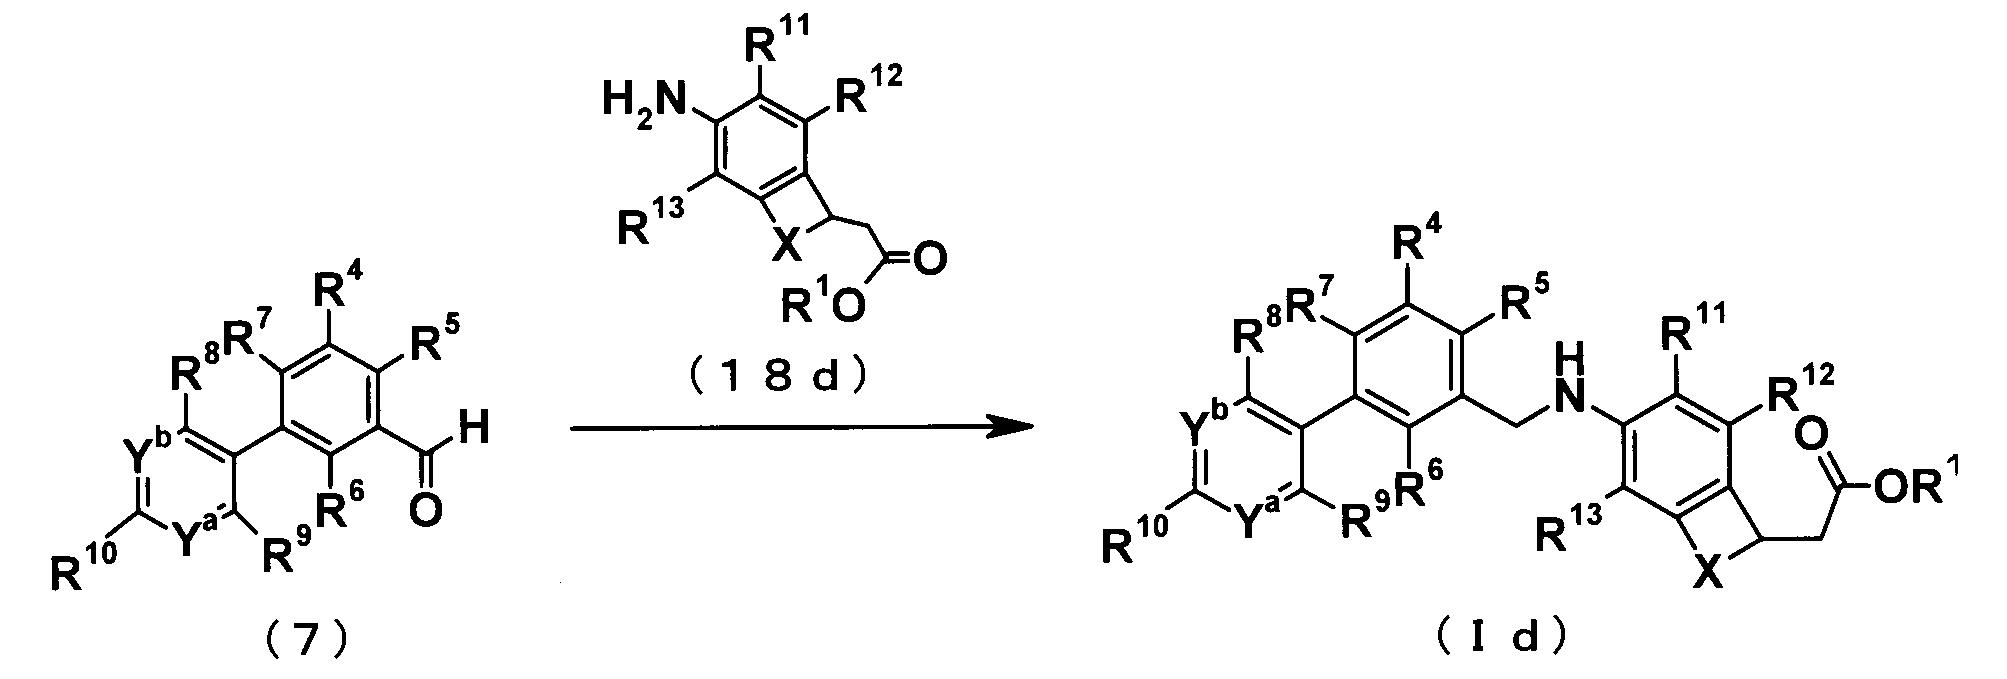 WO2010123016A1 - カルボン酸化合物         - Google PatentsFamily